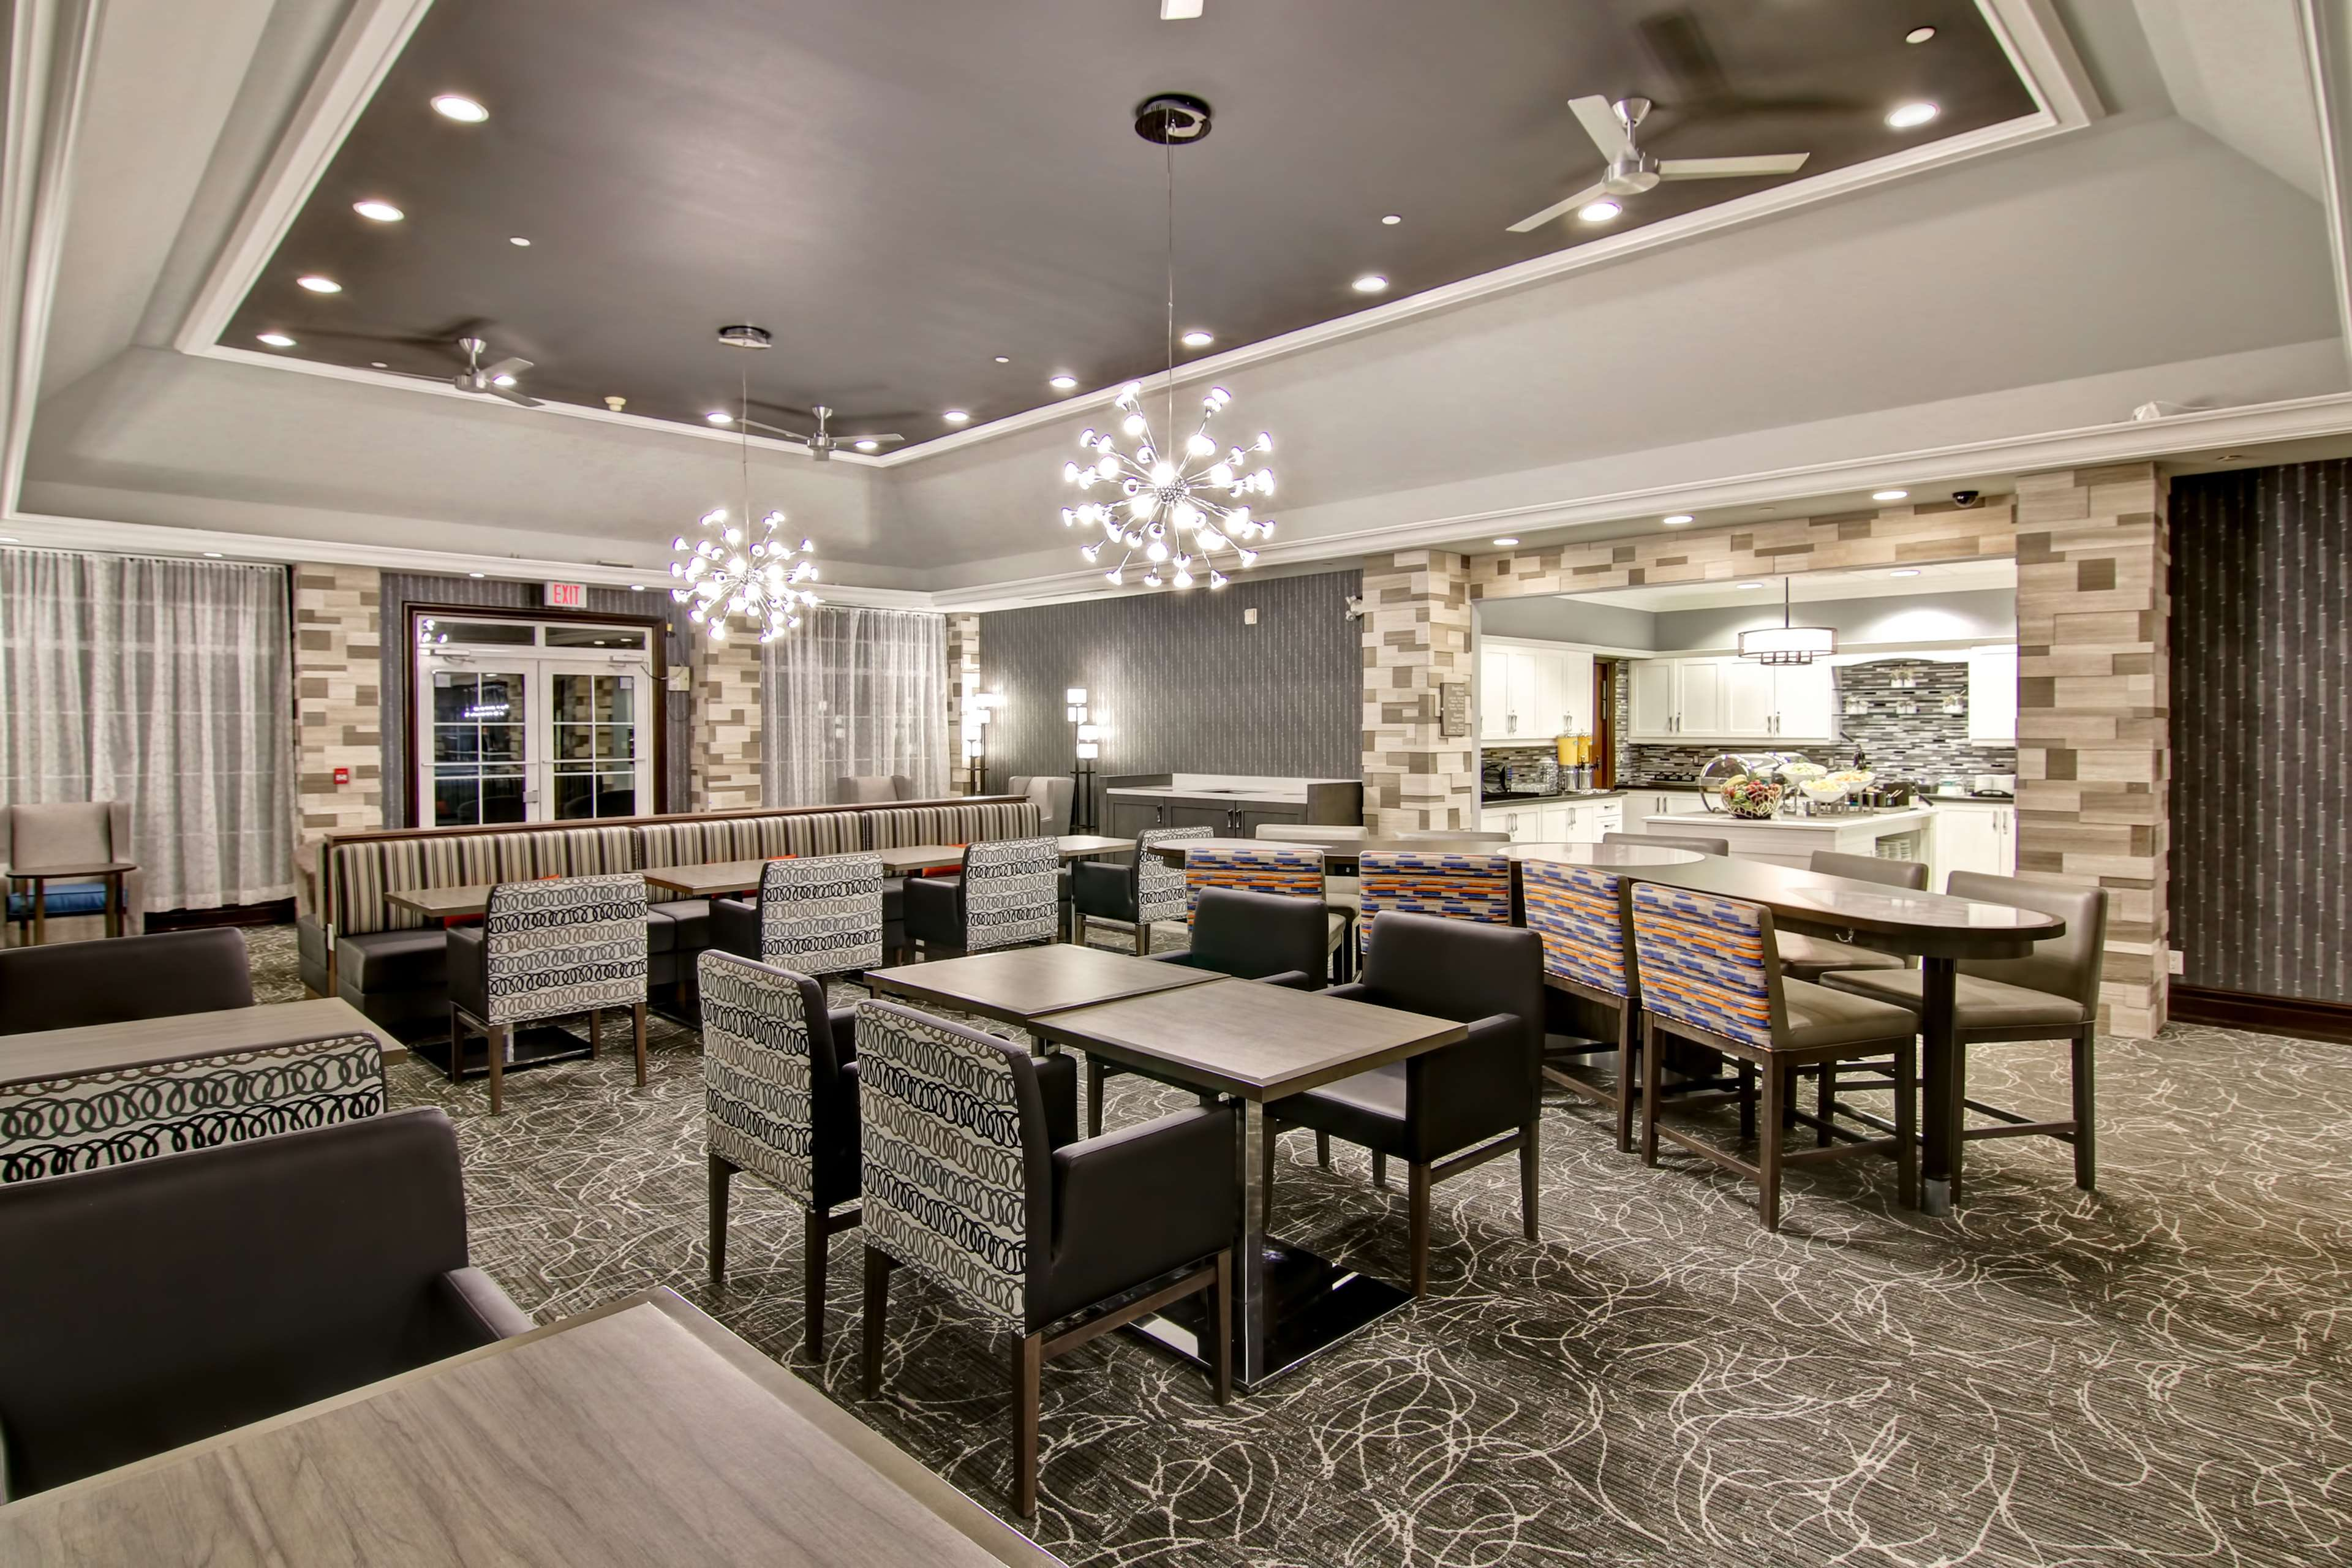 Homewood Suites by Hilton Burlington in Burlington: Lobby